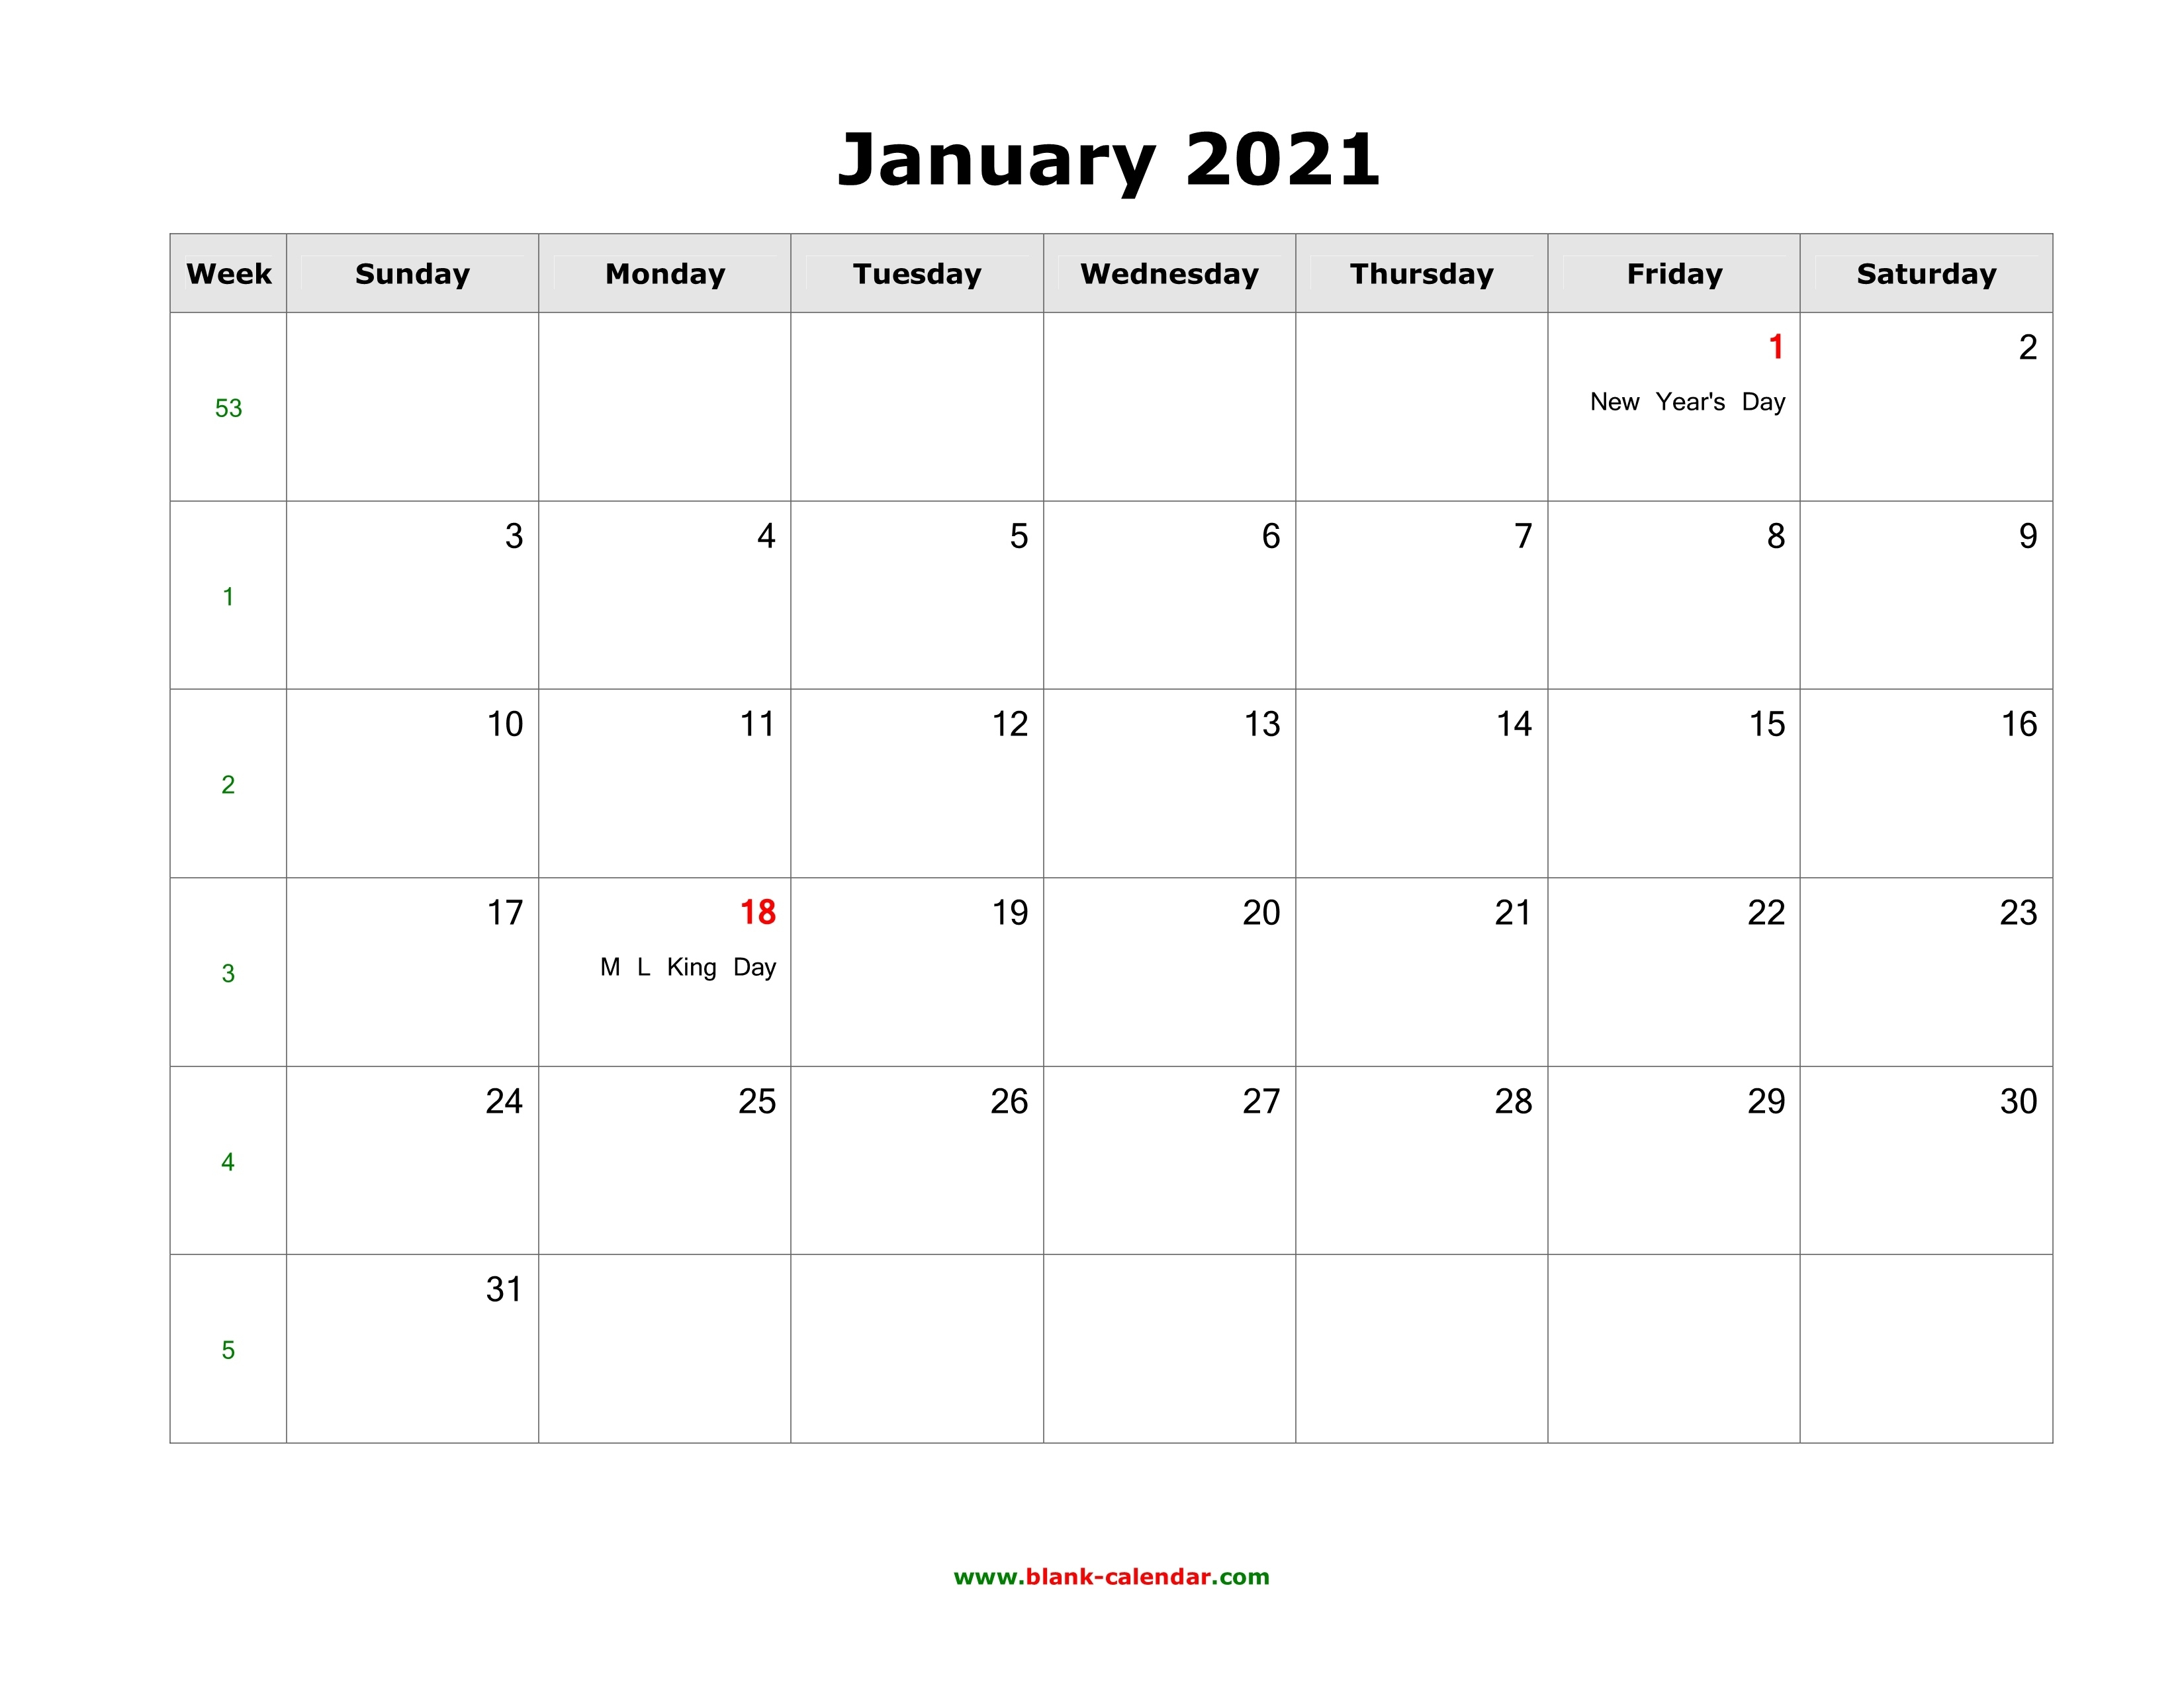 January 2021 Blank Calendar   Free Download Calendar Templates Free Calendars 2021 Word Doc Printable August